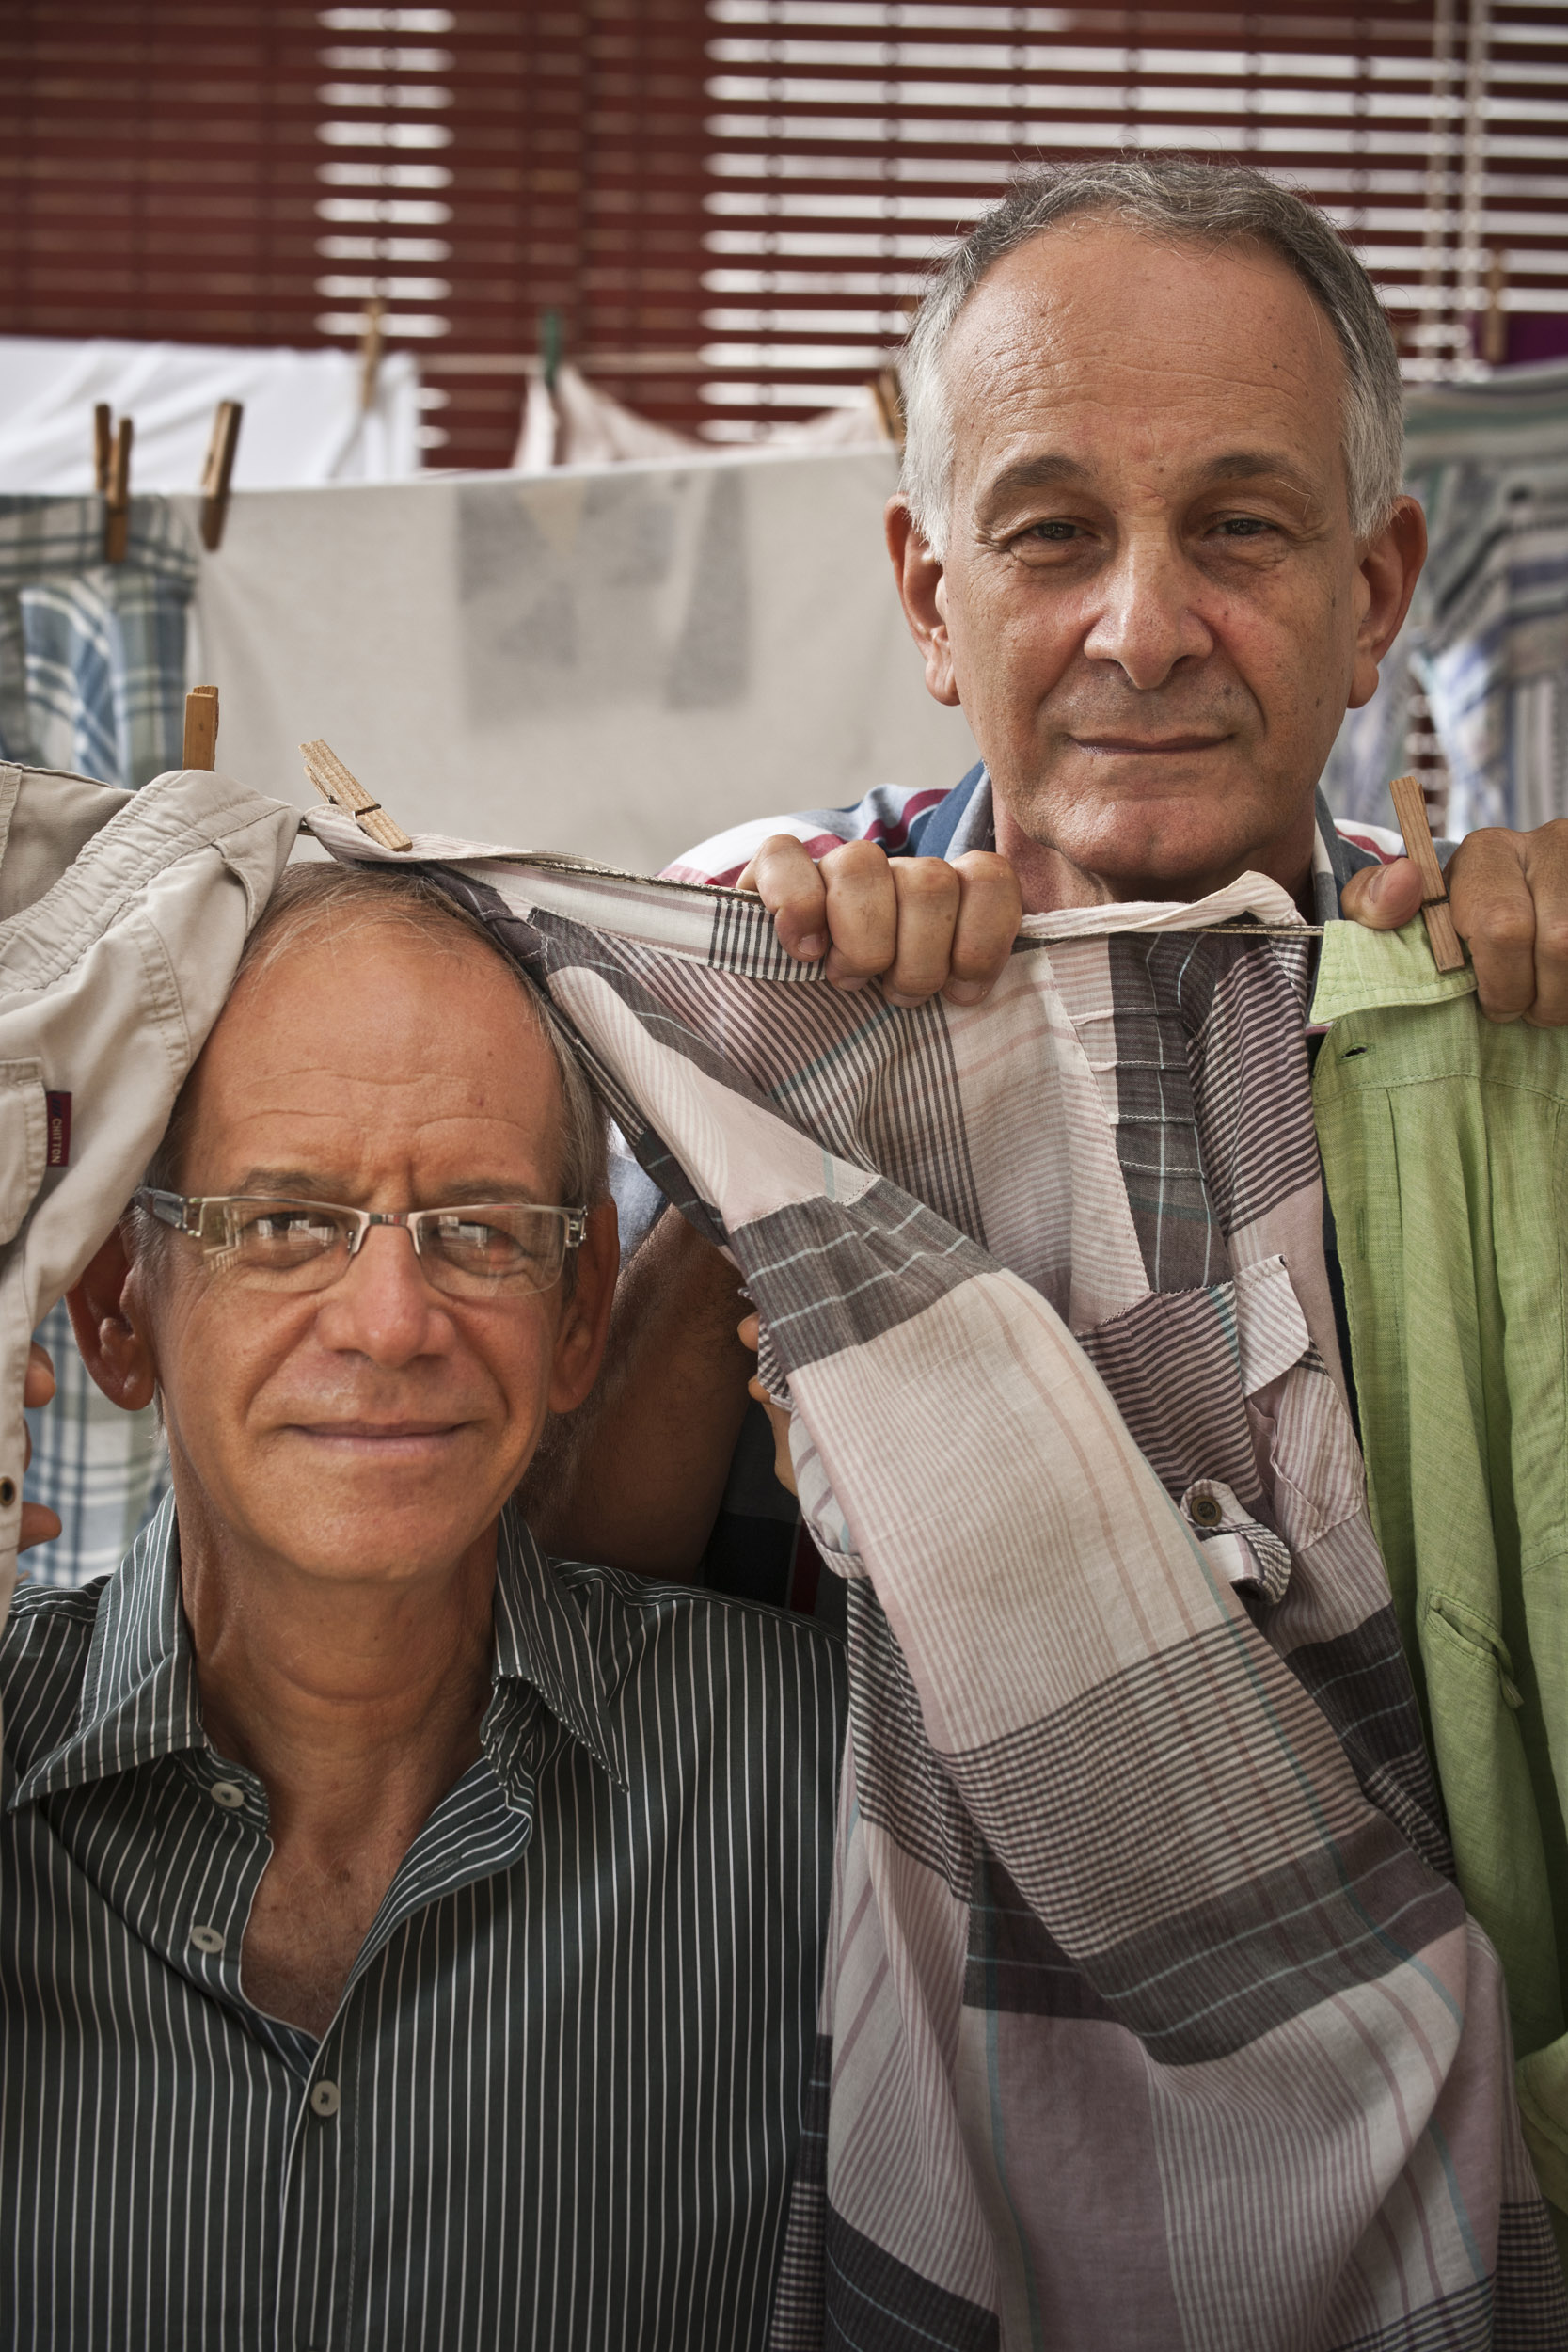 Gerardo Chijona y Daniel Díaz-Torres, filmmakers - Illuminated Cuba - Hector Garrido, Aerial and human photography